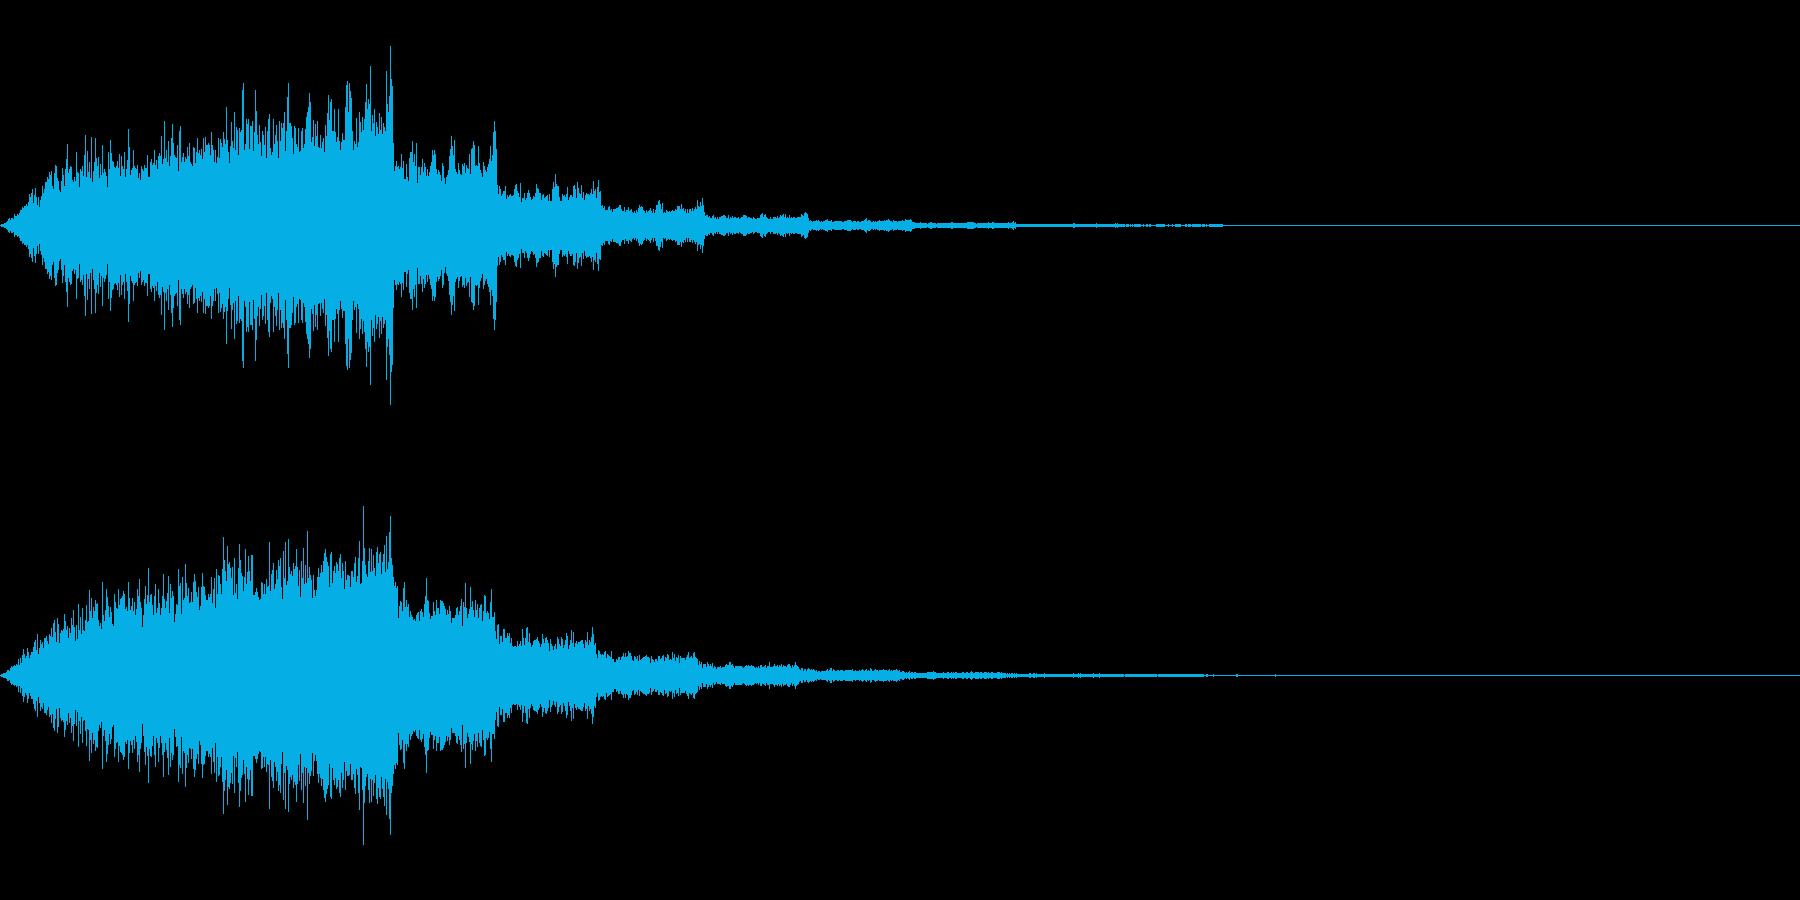 Dark_SweepUp-08Delayの再生済みの波形